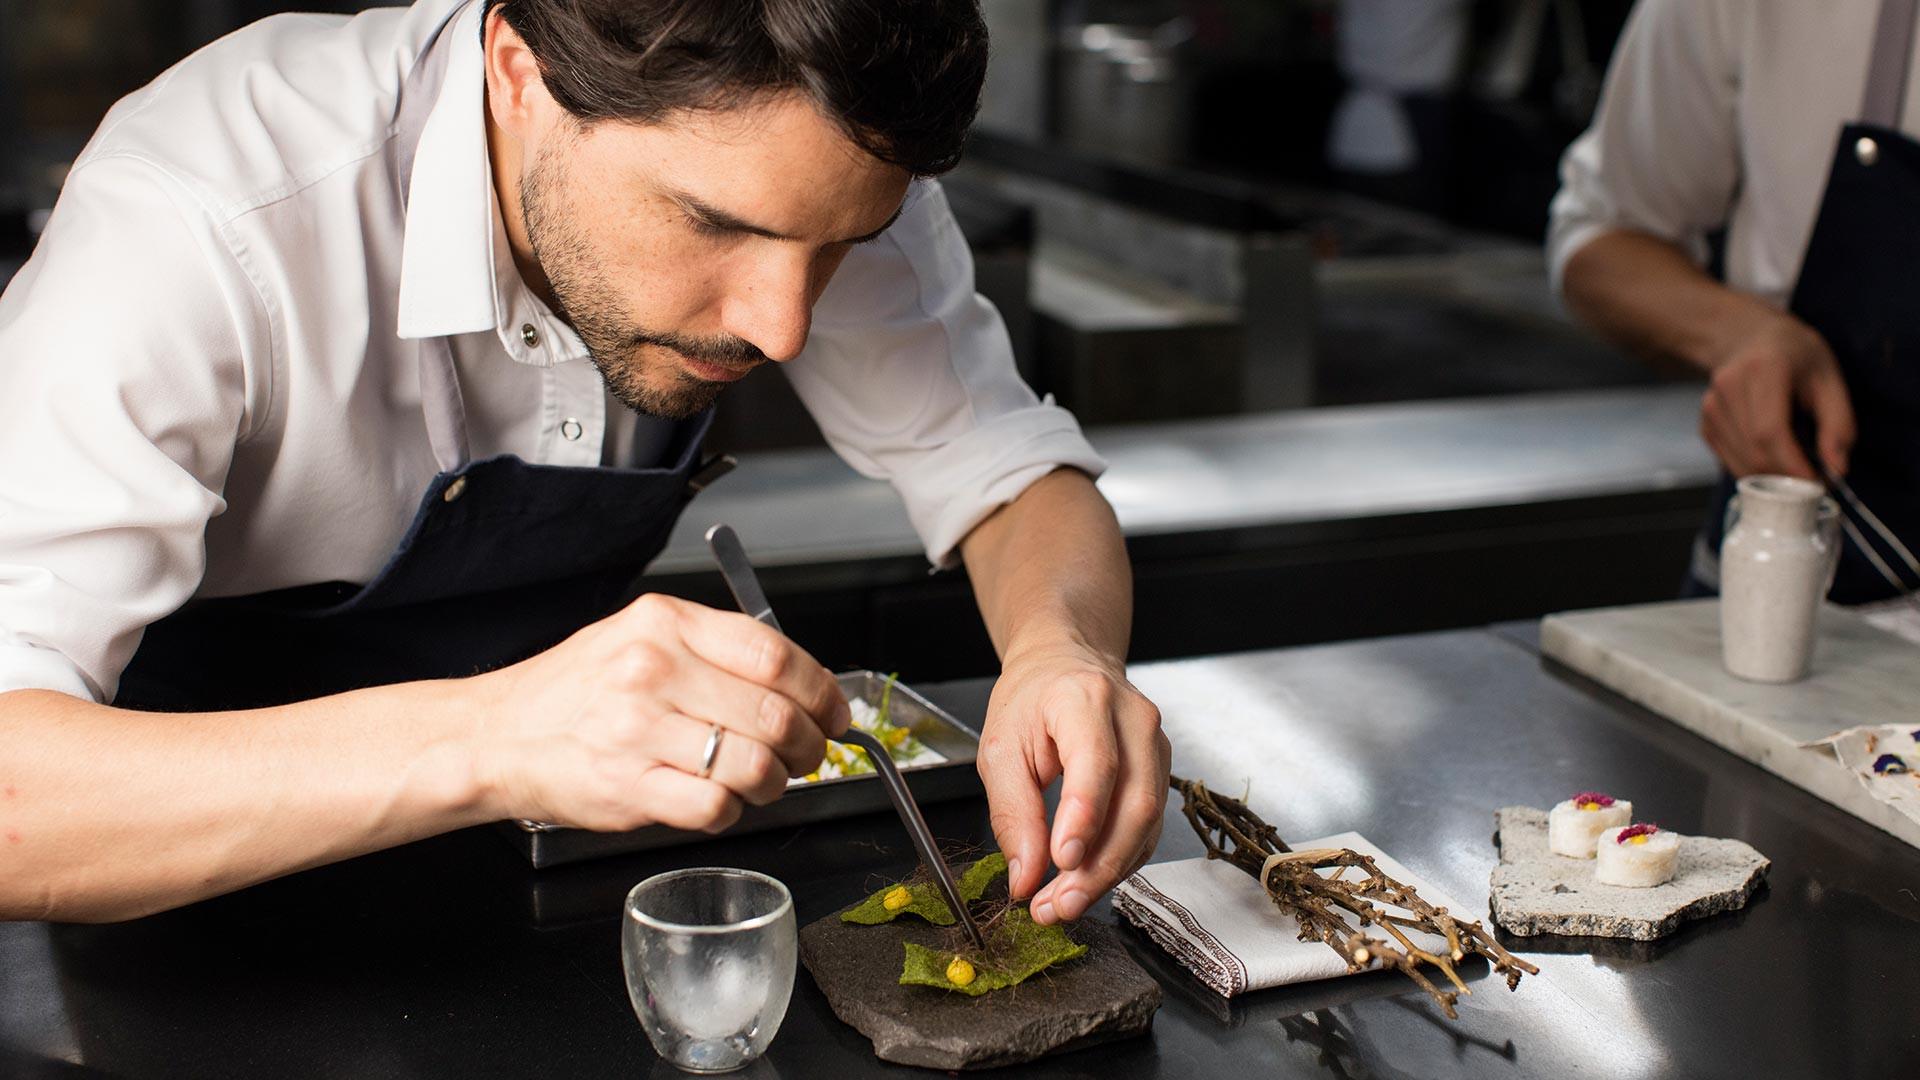 Le Cordon Bleu's chef ambassador Virgilio Martinez